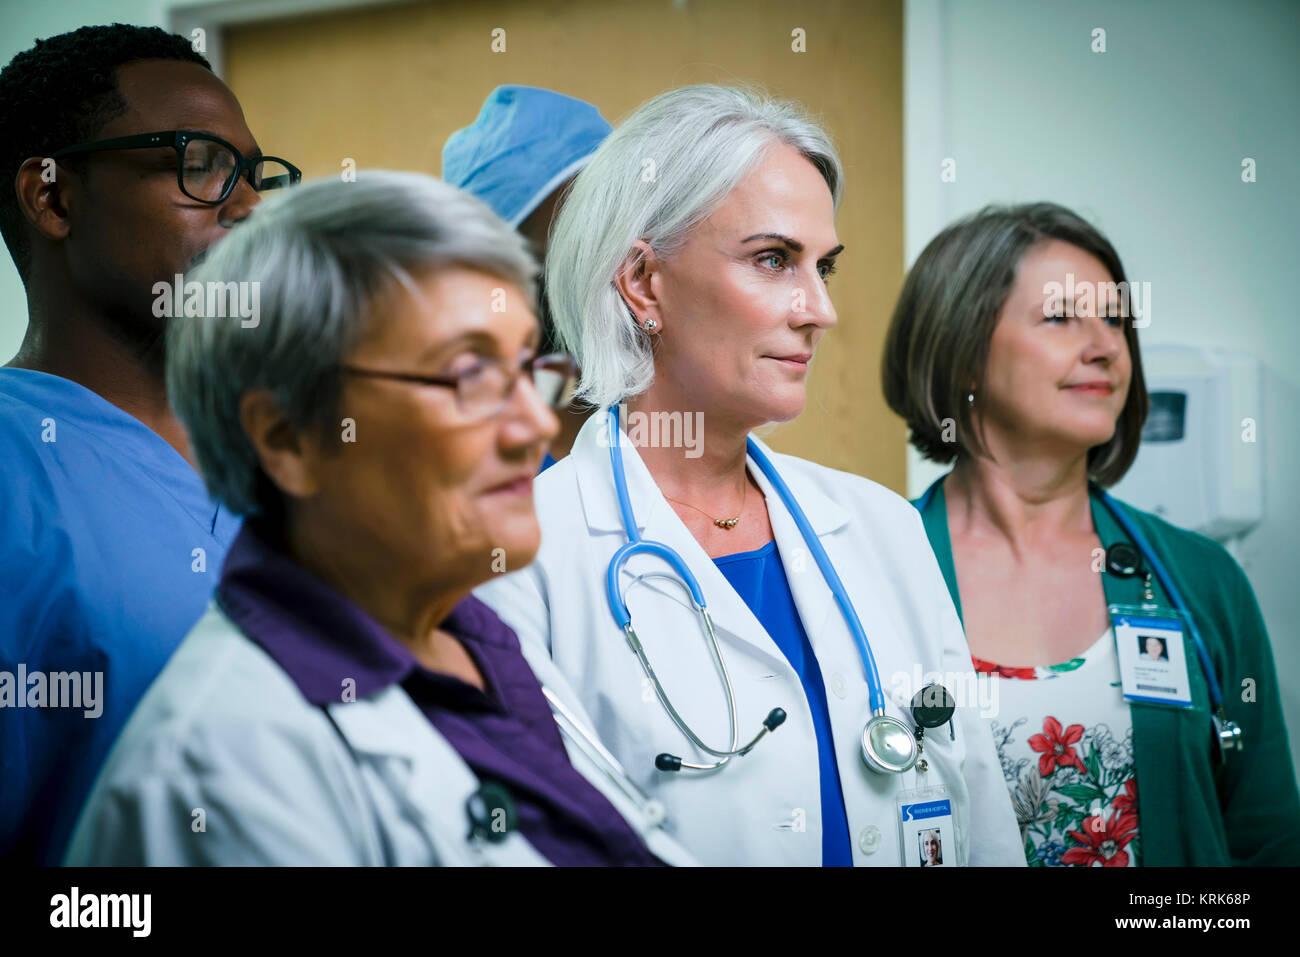 Portrait of confident medical team - Stock Image